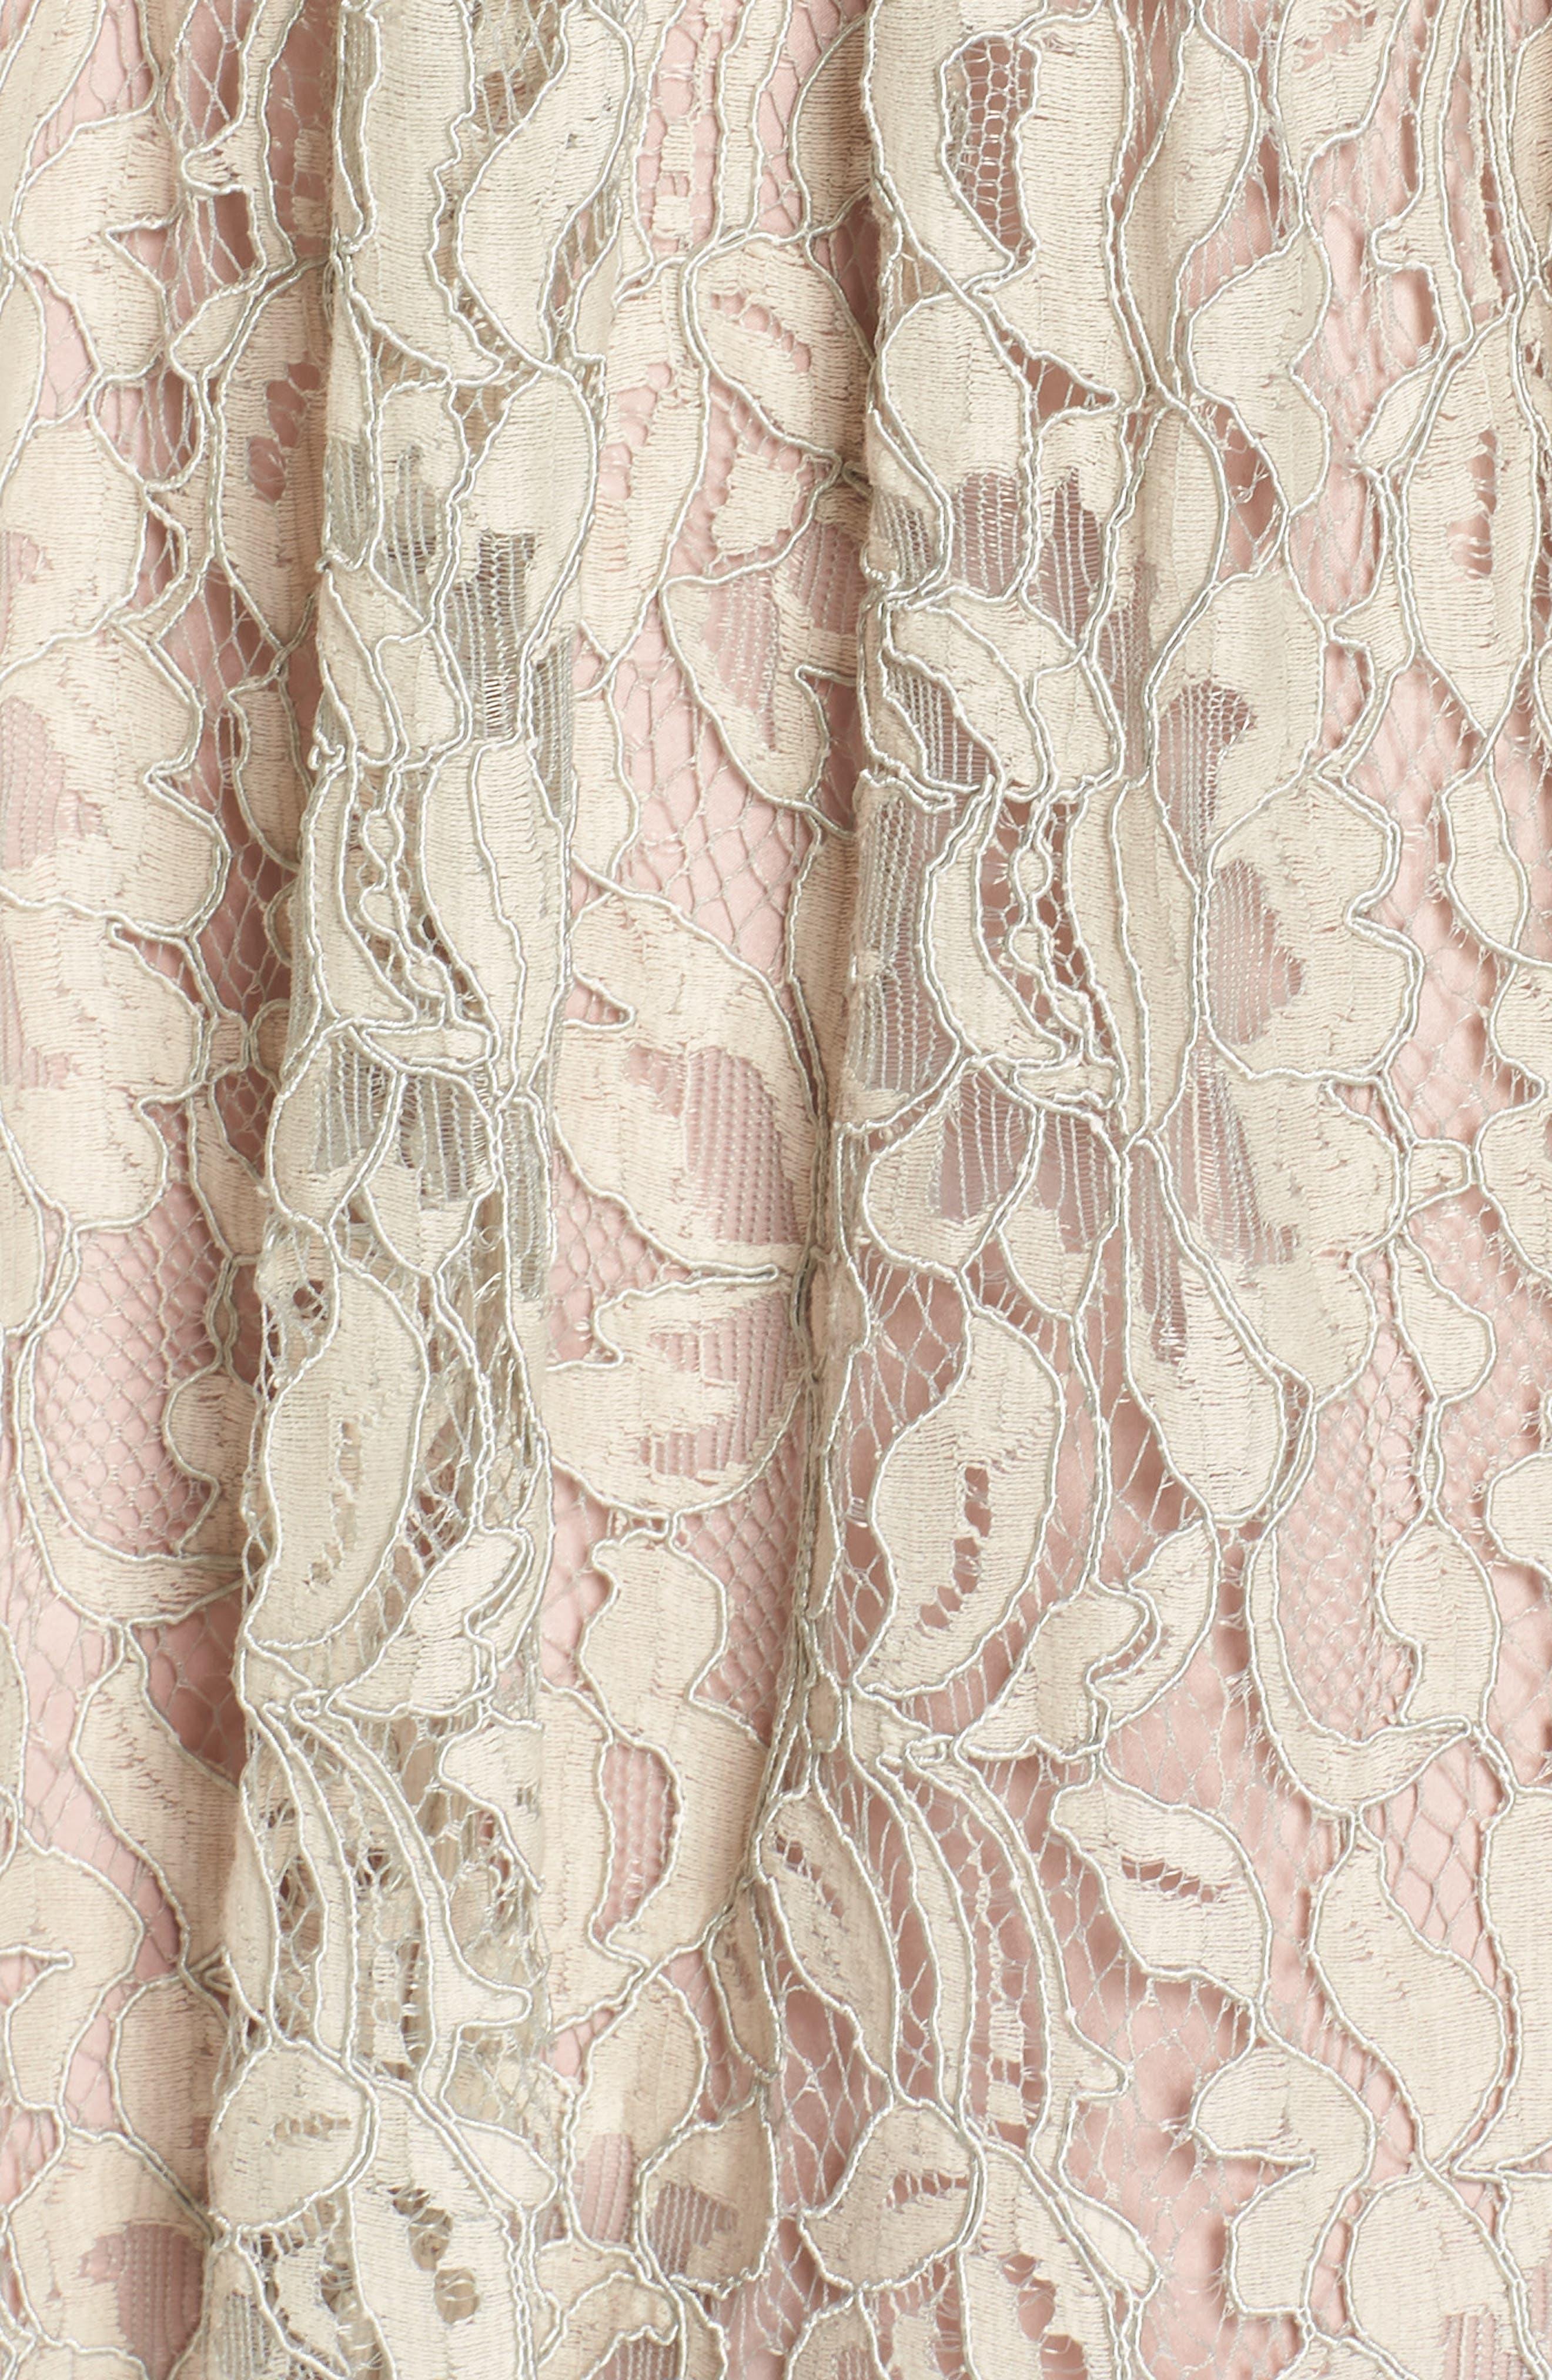 Lace Fit & Flare Dress,                             Alternate thumbnail 6, color,                             900